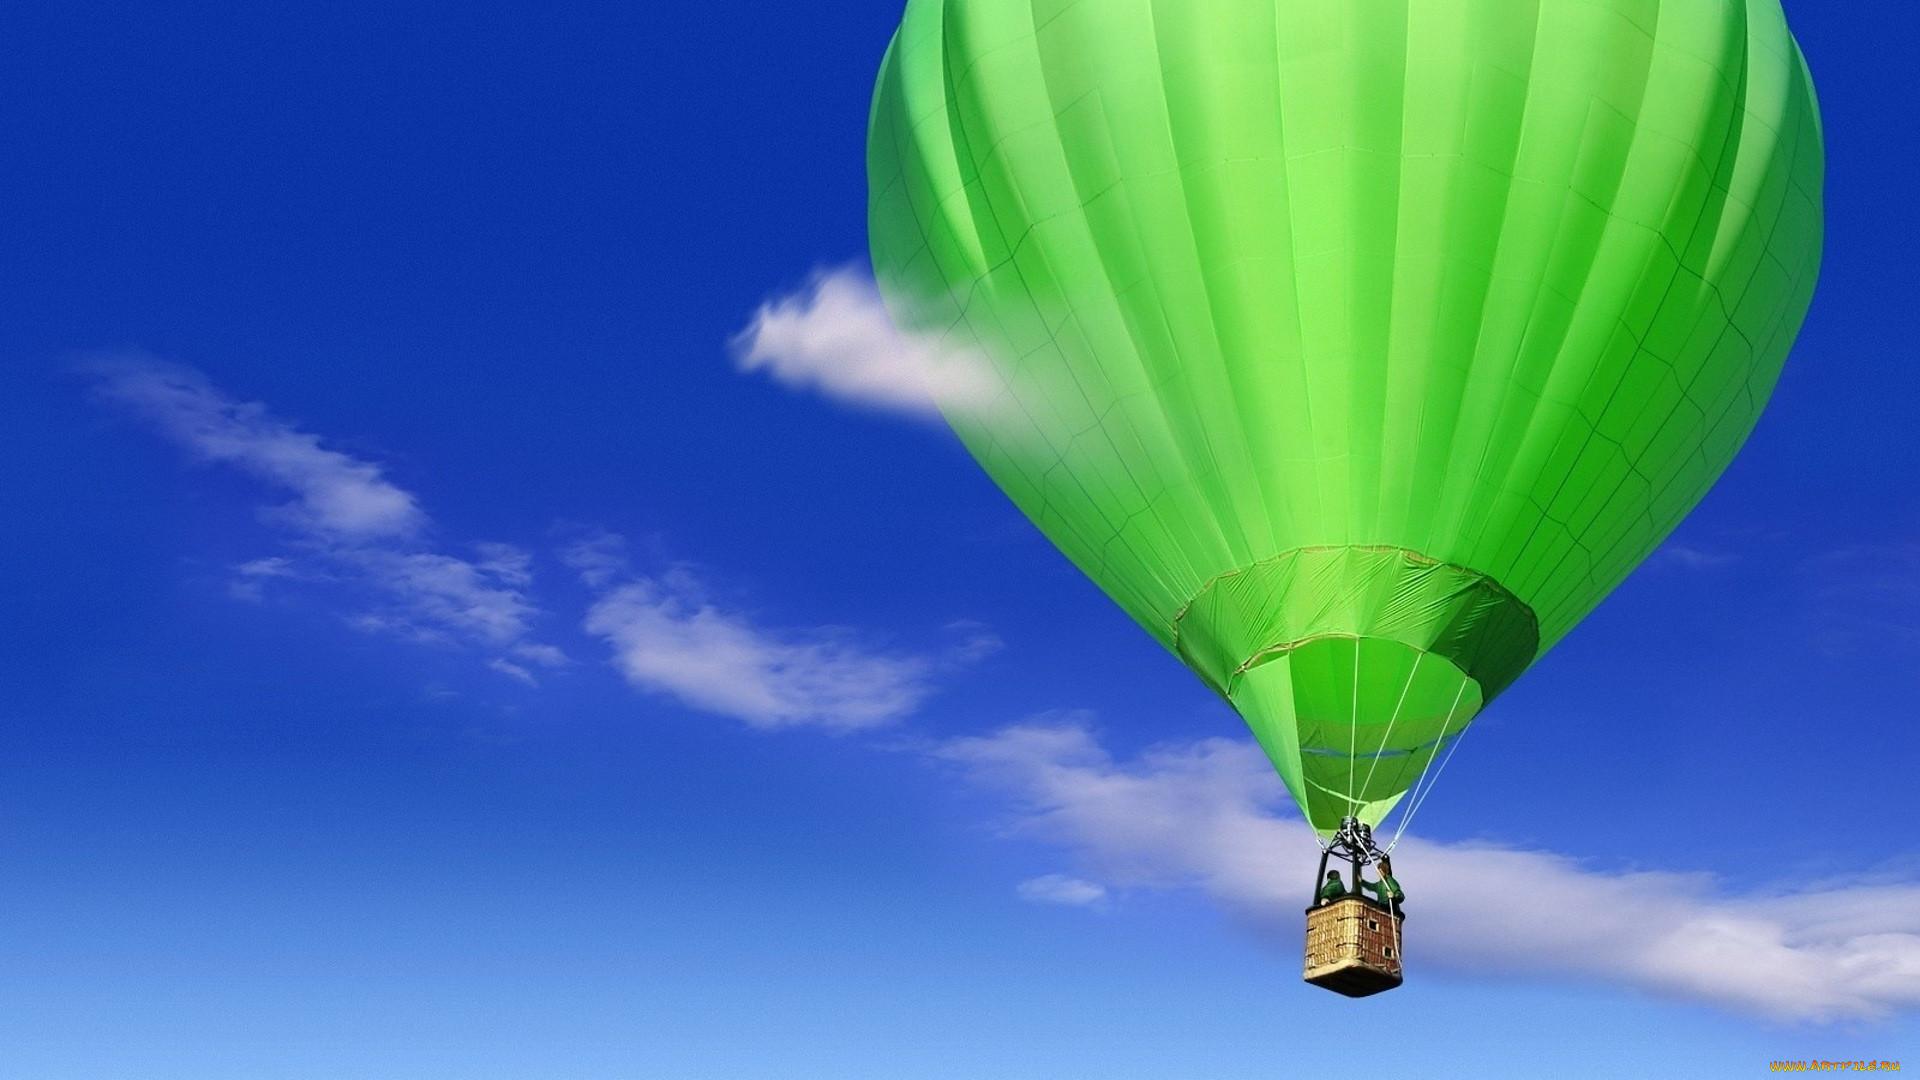 Обои воздушный шар, корзина. Авиация foto 14